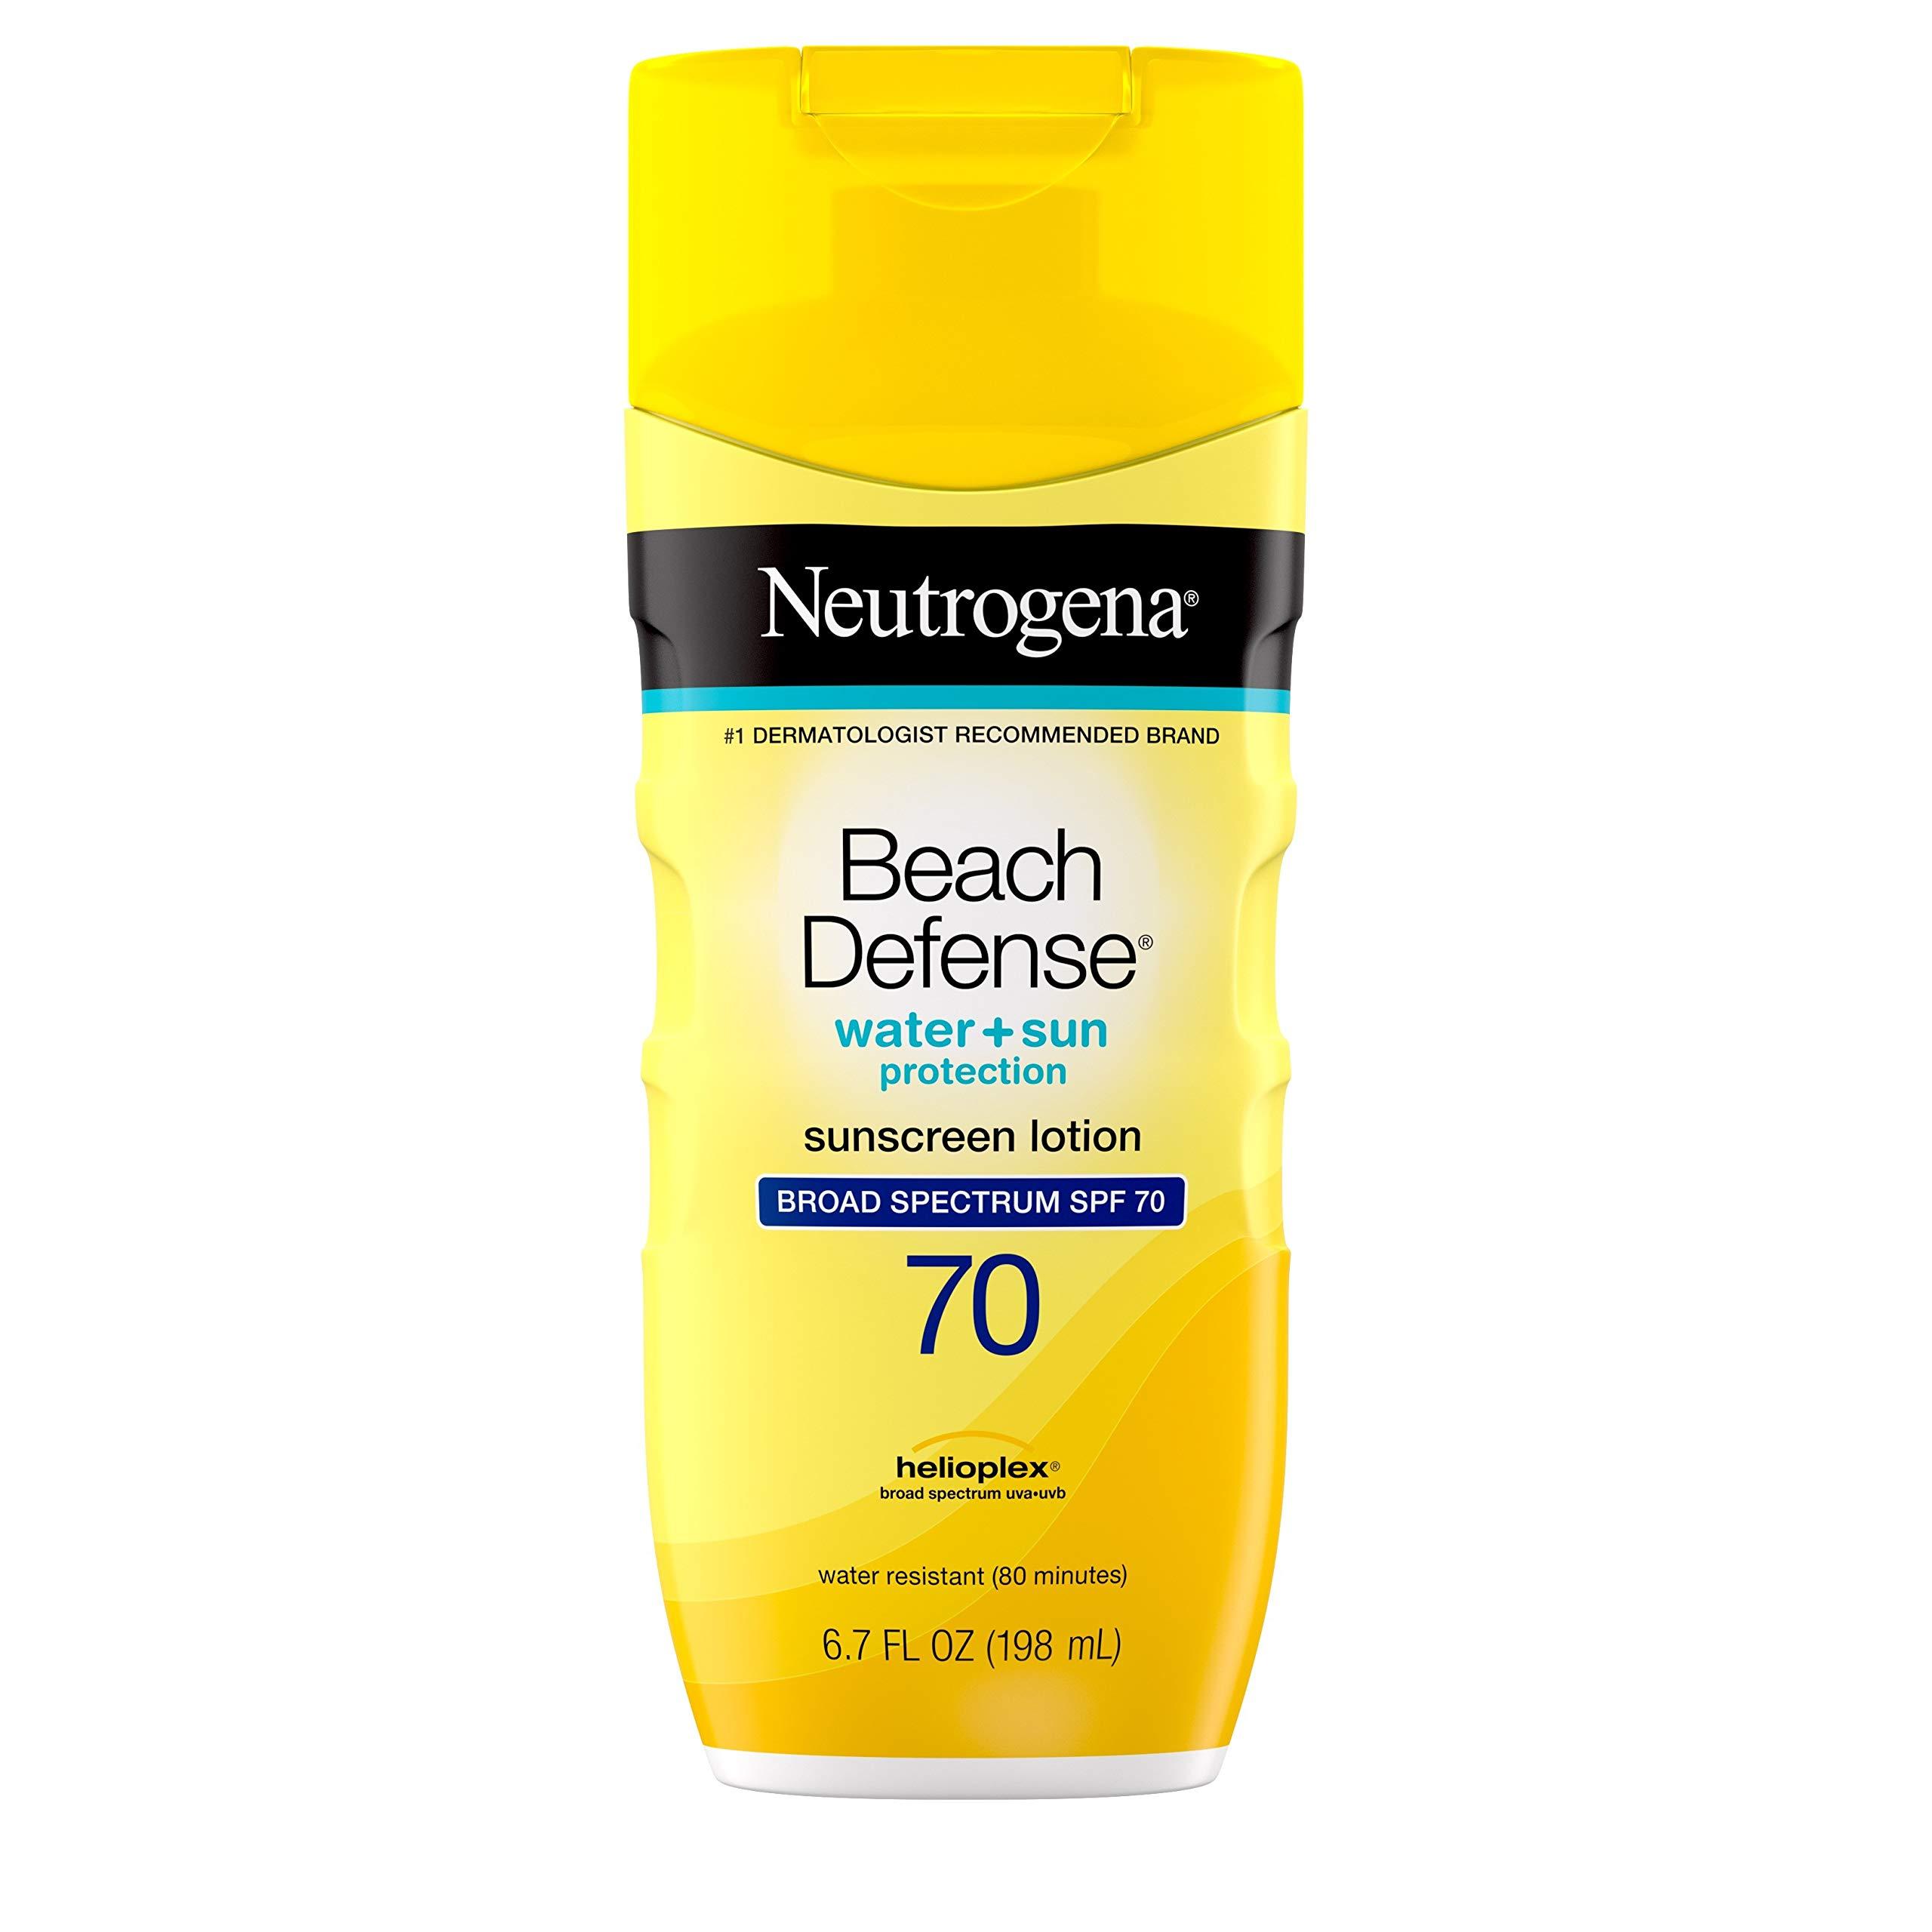 Neutrogena Resistant Sunscreen Spectrum Fast Absorbing